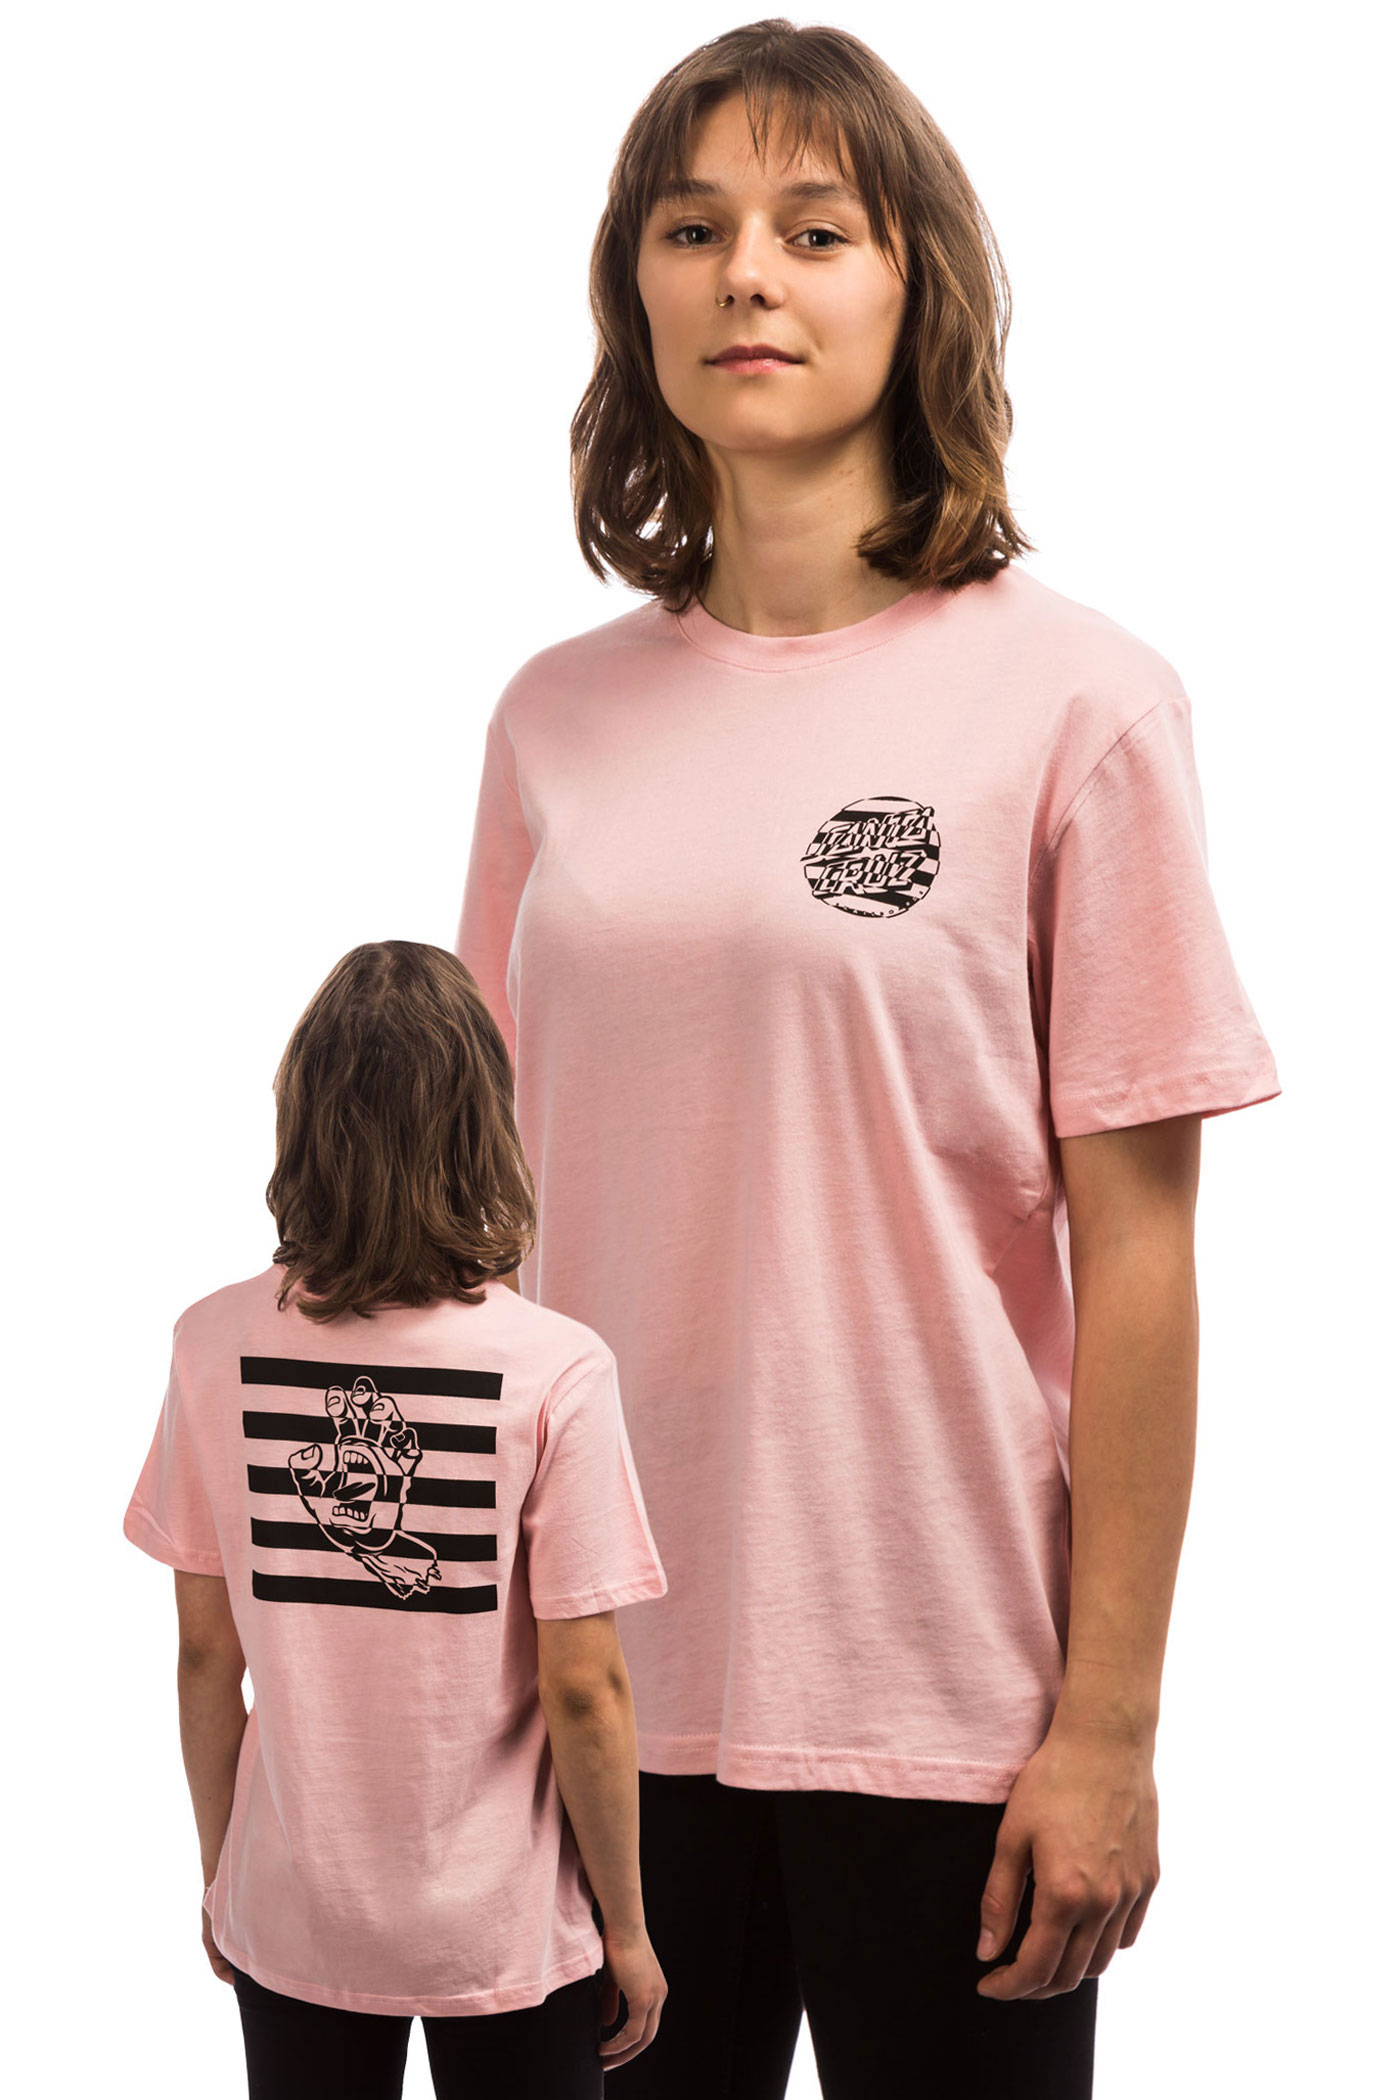 T Hand Santa Womencandy Pink Cruz Strobe shirt dtsrCxQBh